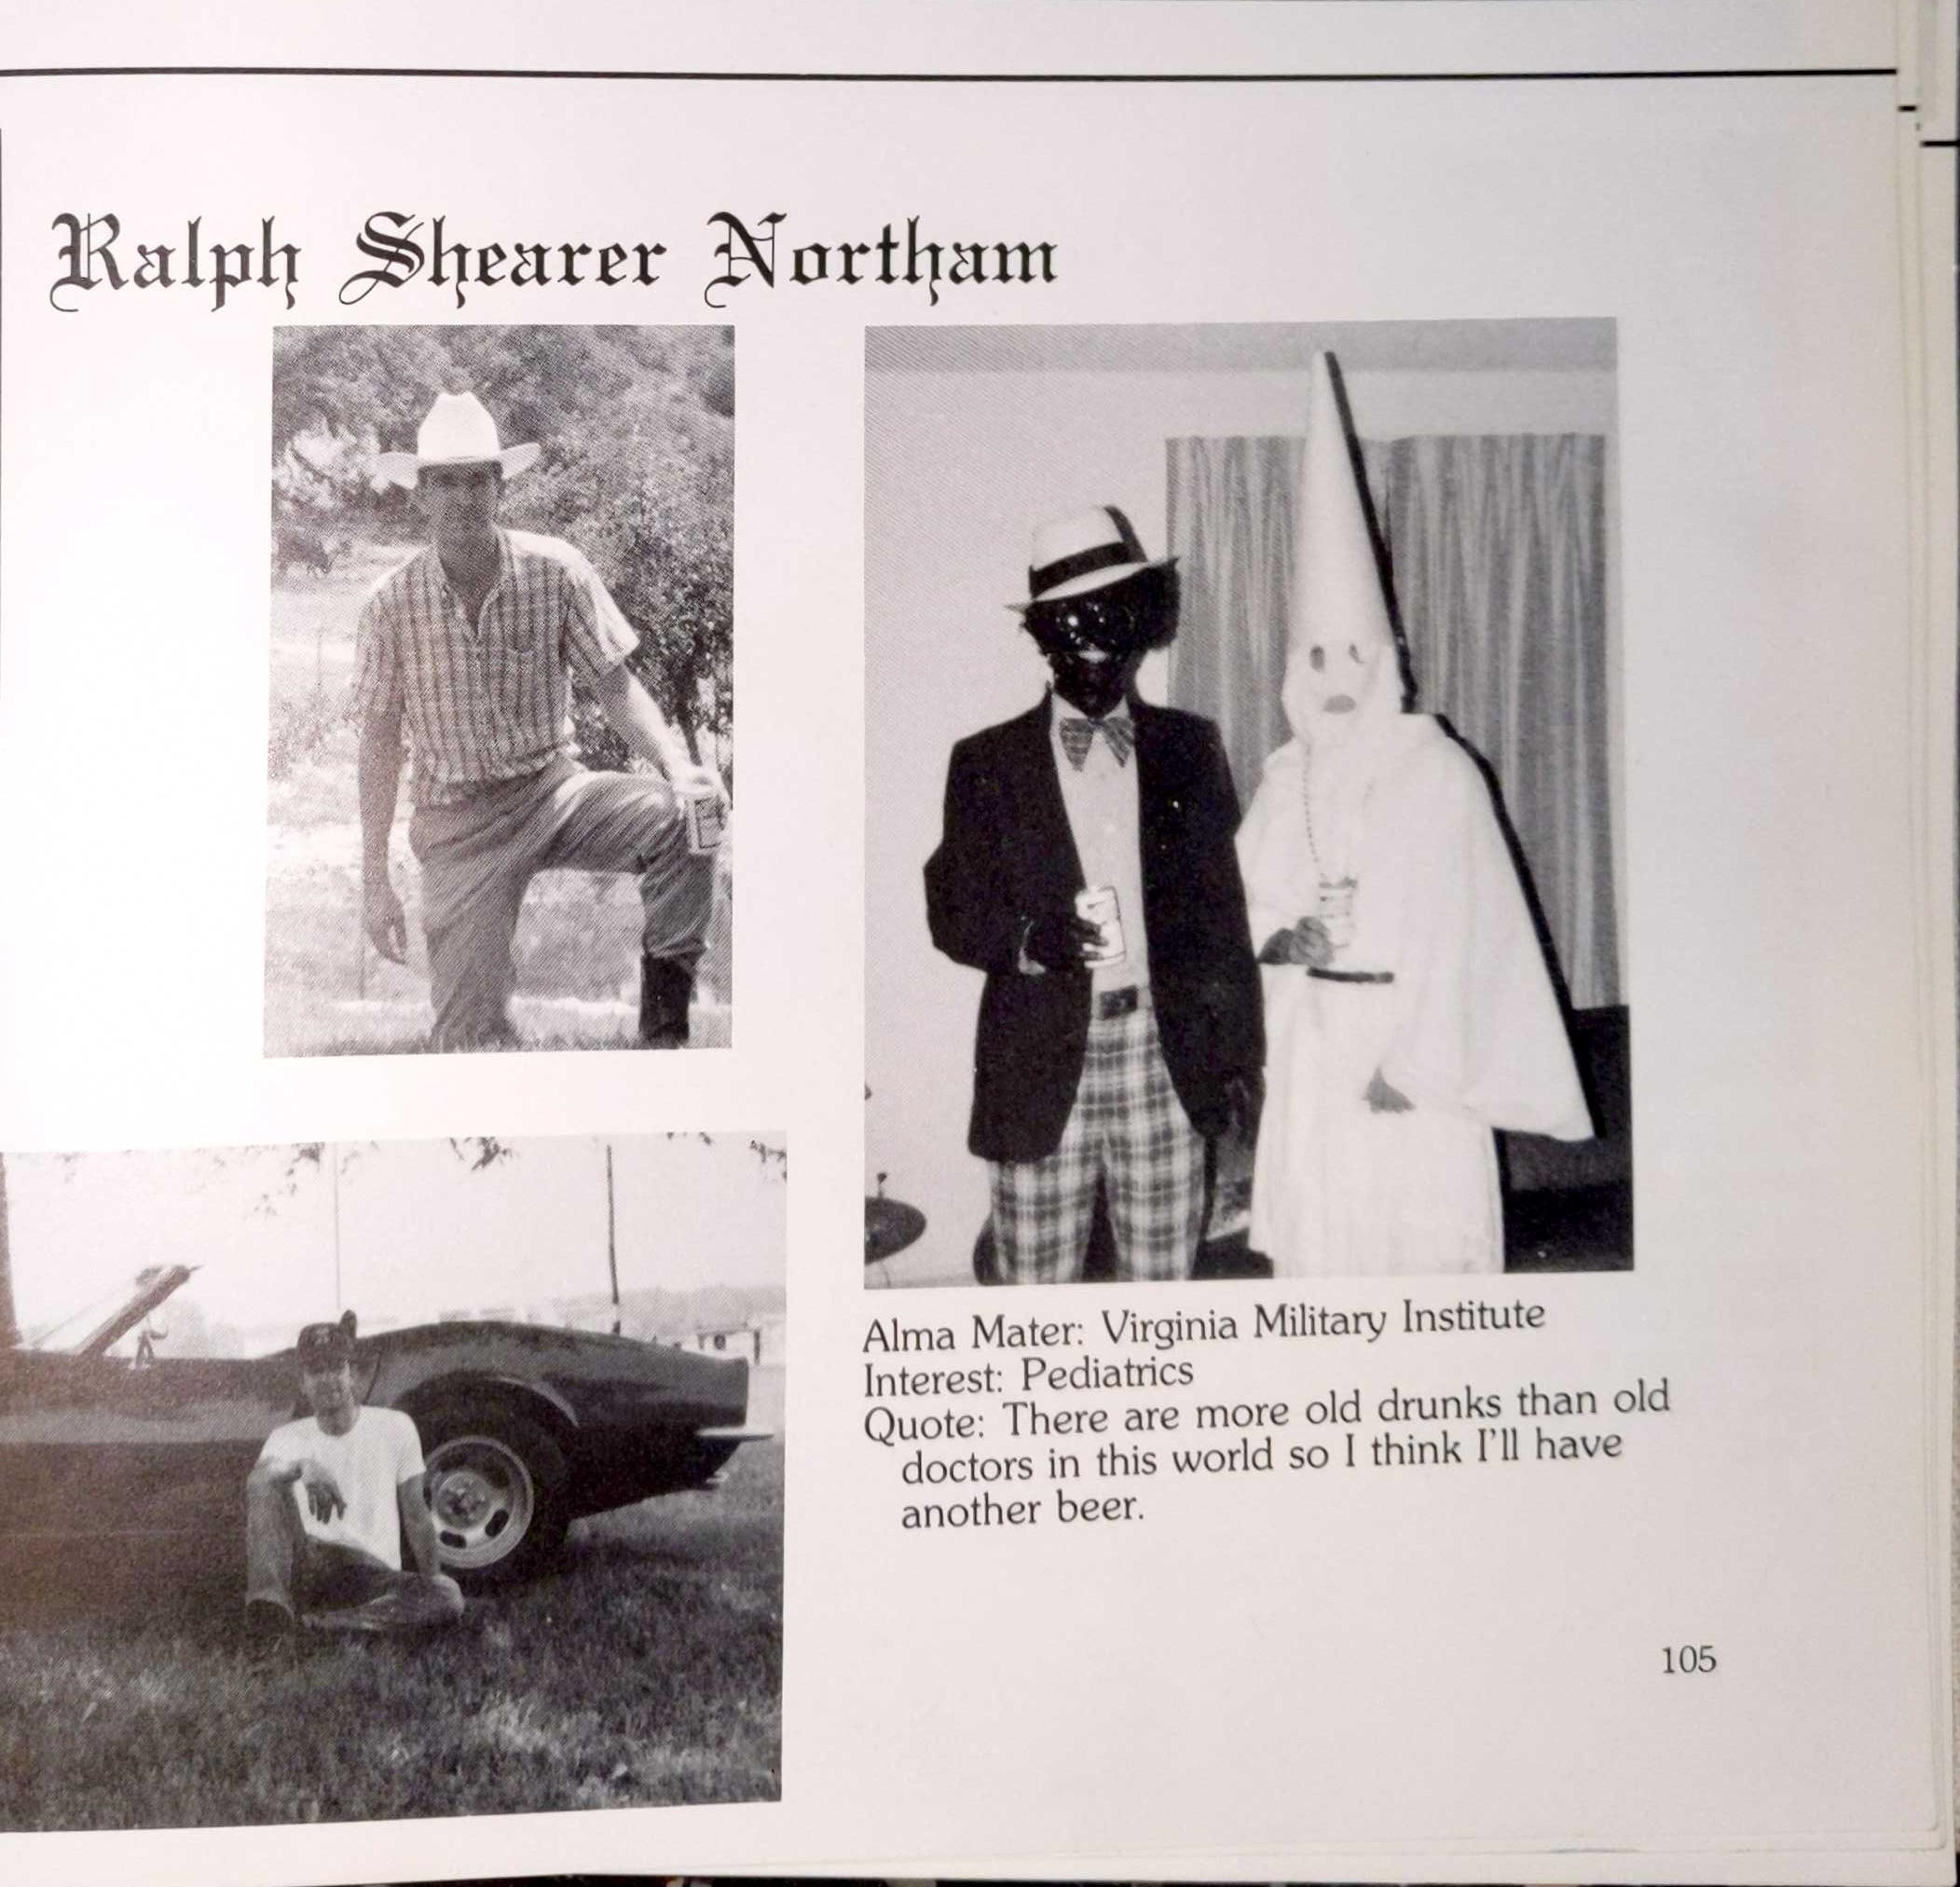 Kkk Halloween Costume Amazon.Virginia Gov Ralph Northam Admits He Was In 1984 Yearbook Photo